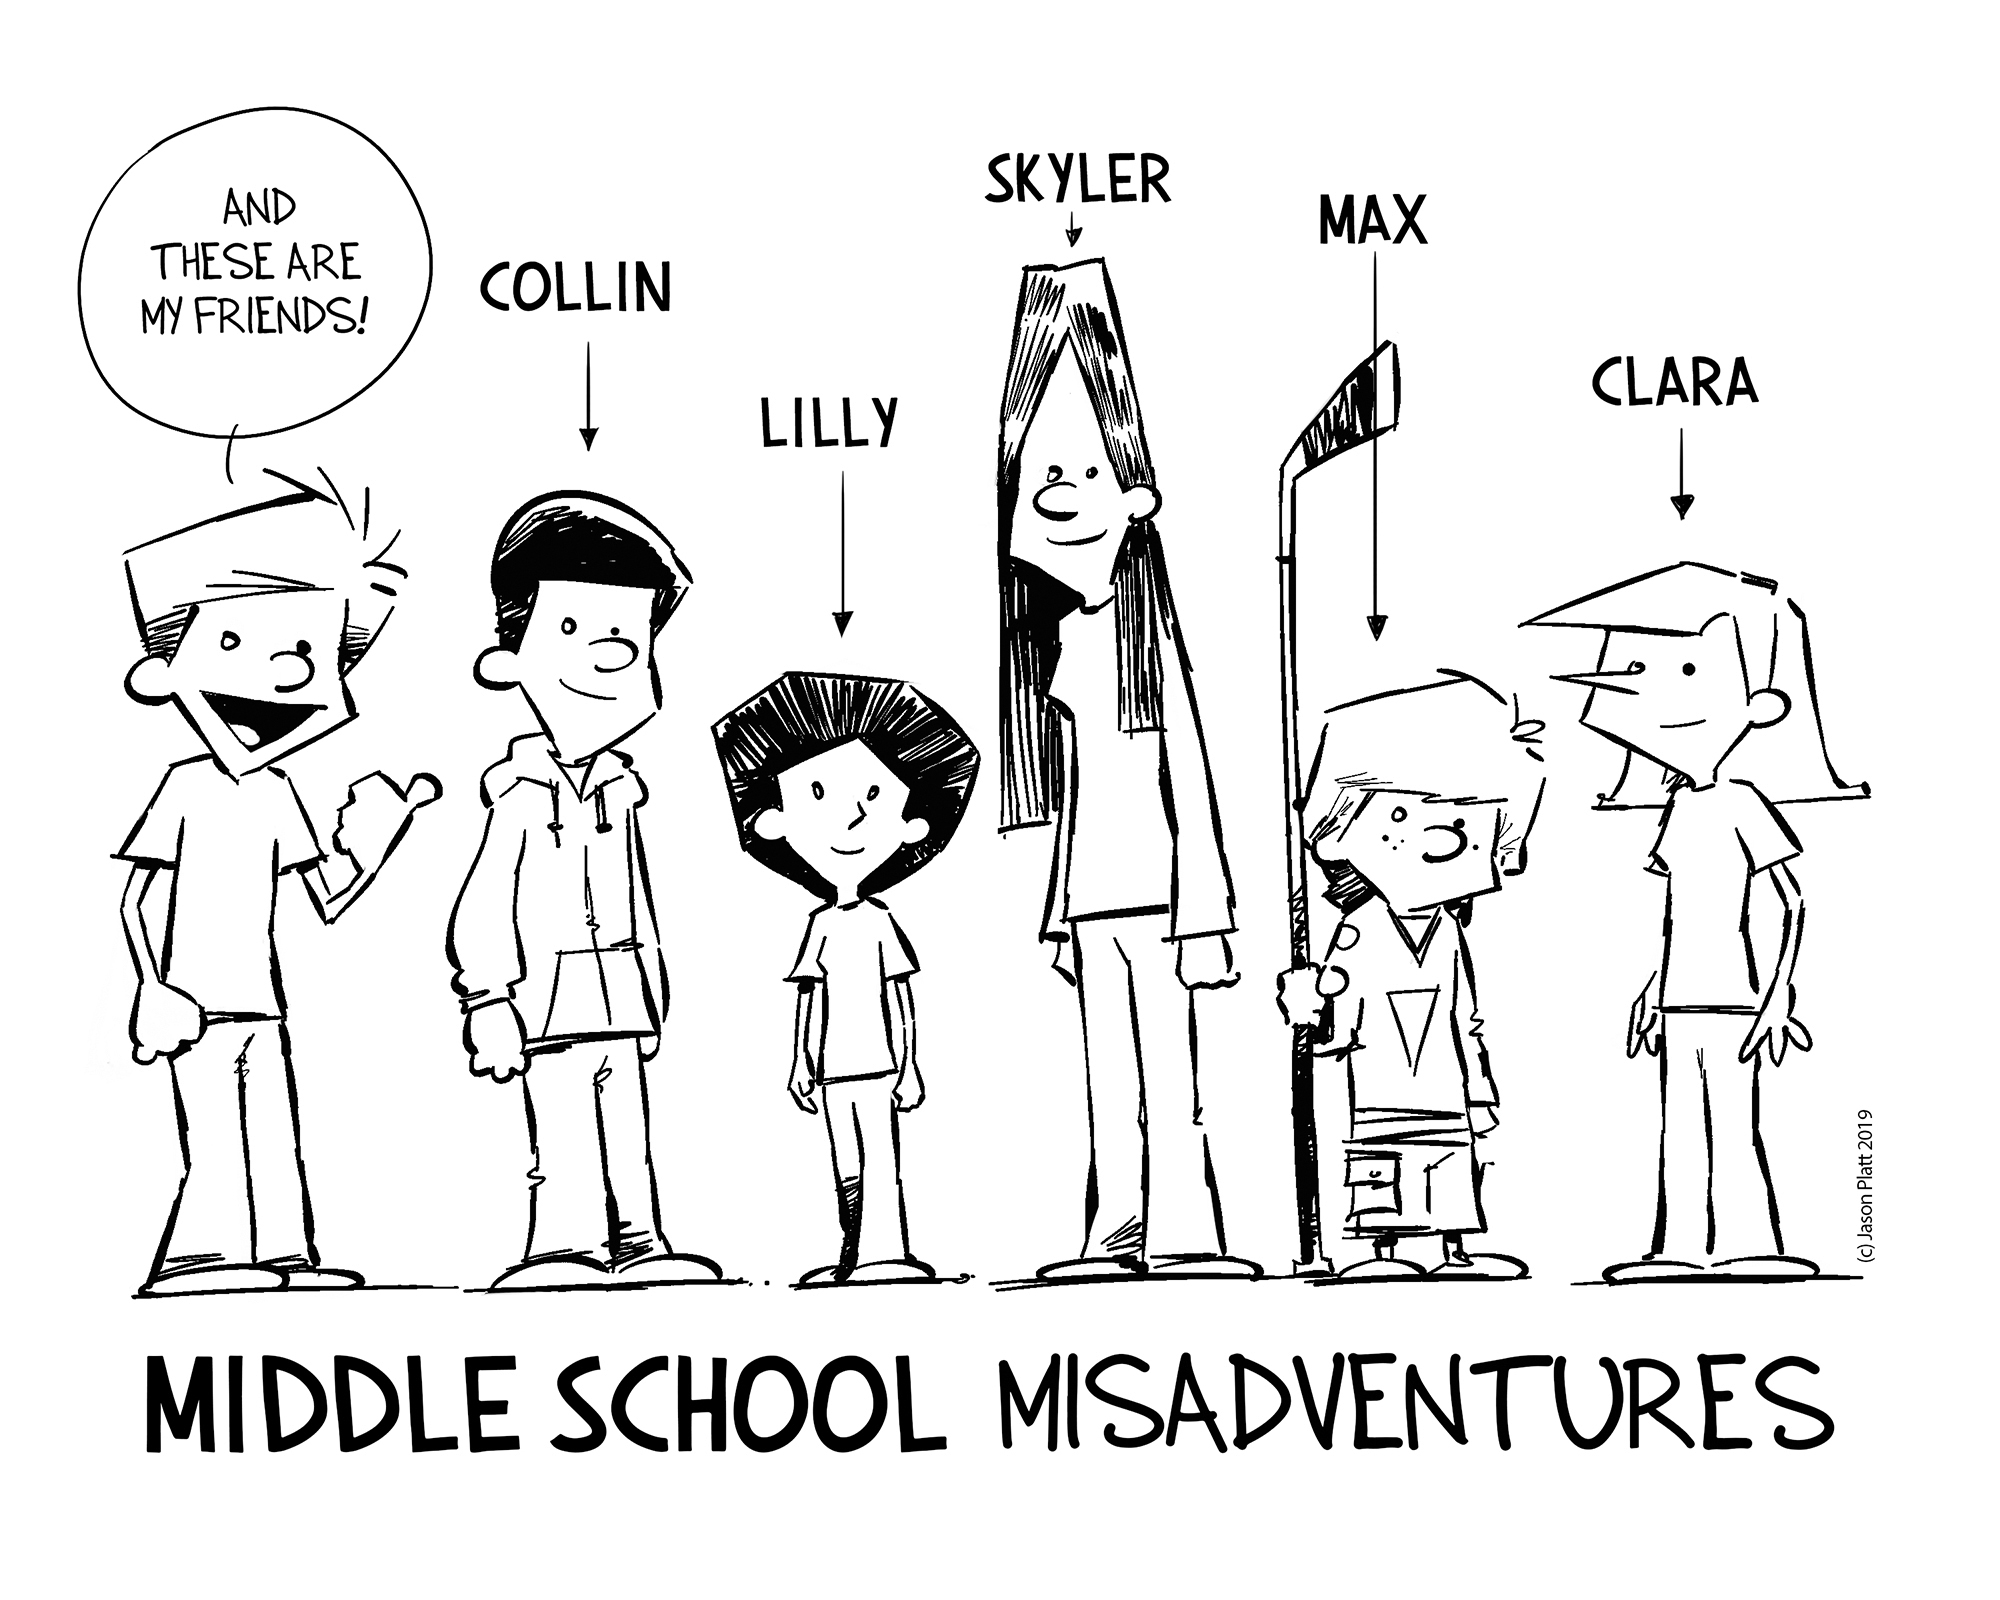 MiddleSchoolMisadventures_Coloring Page_2 (1).jpg